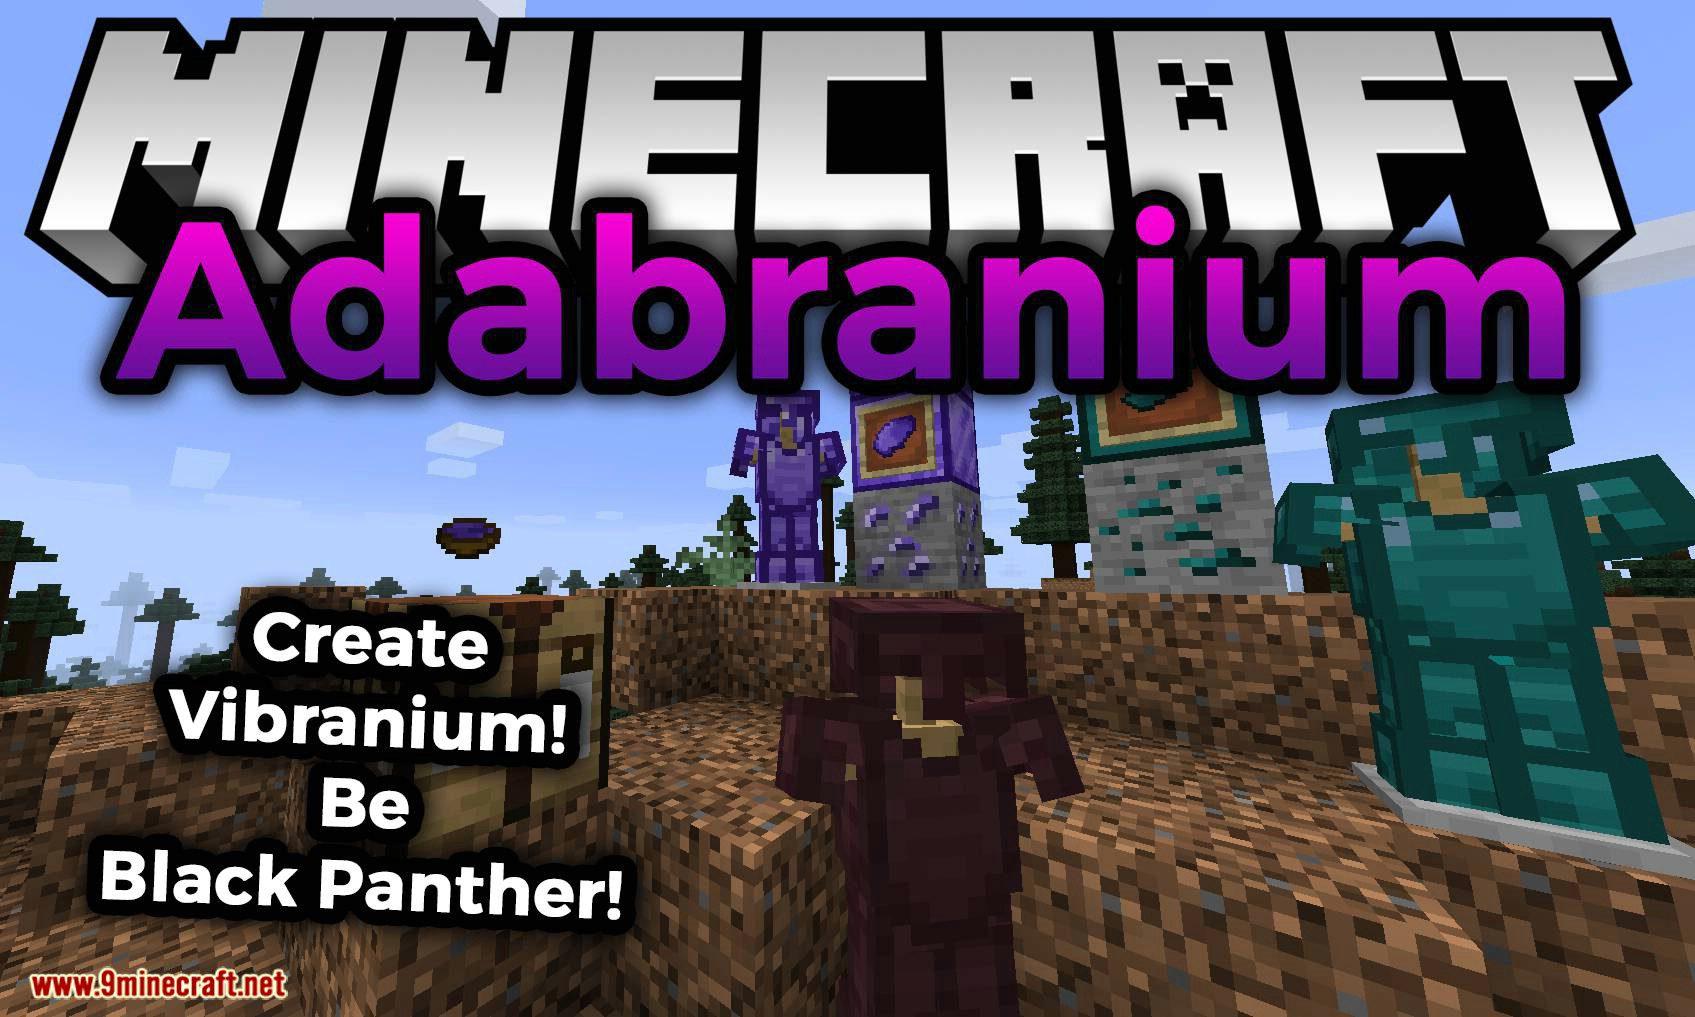 Adabranium mod for minecraft logo